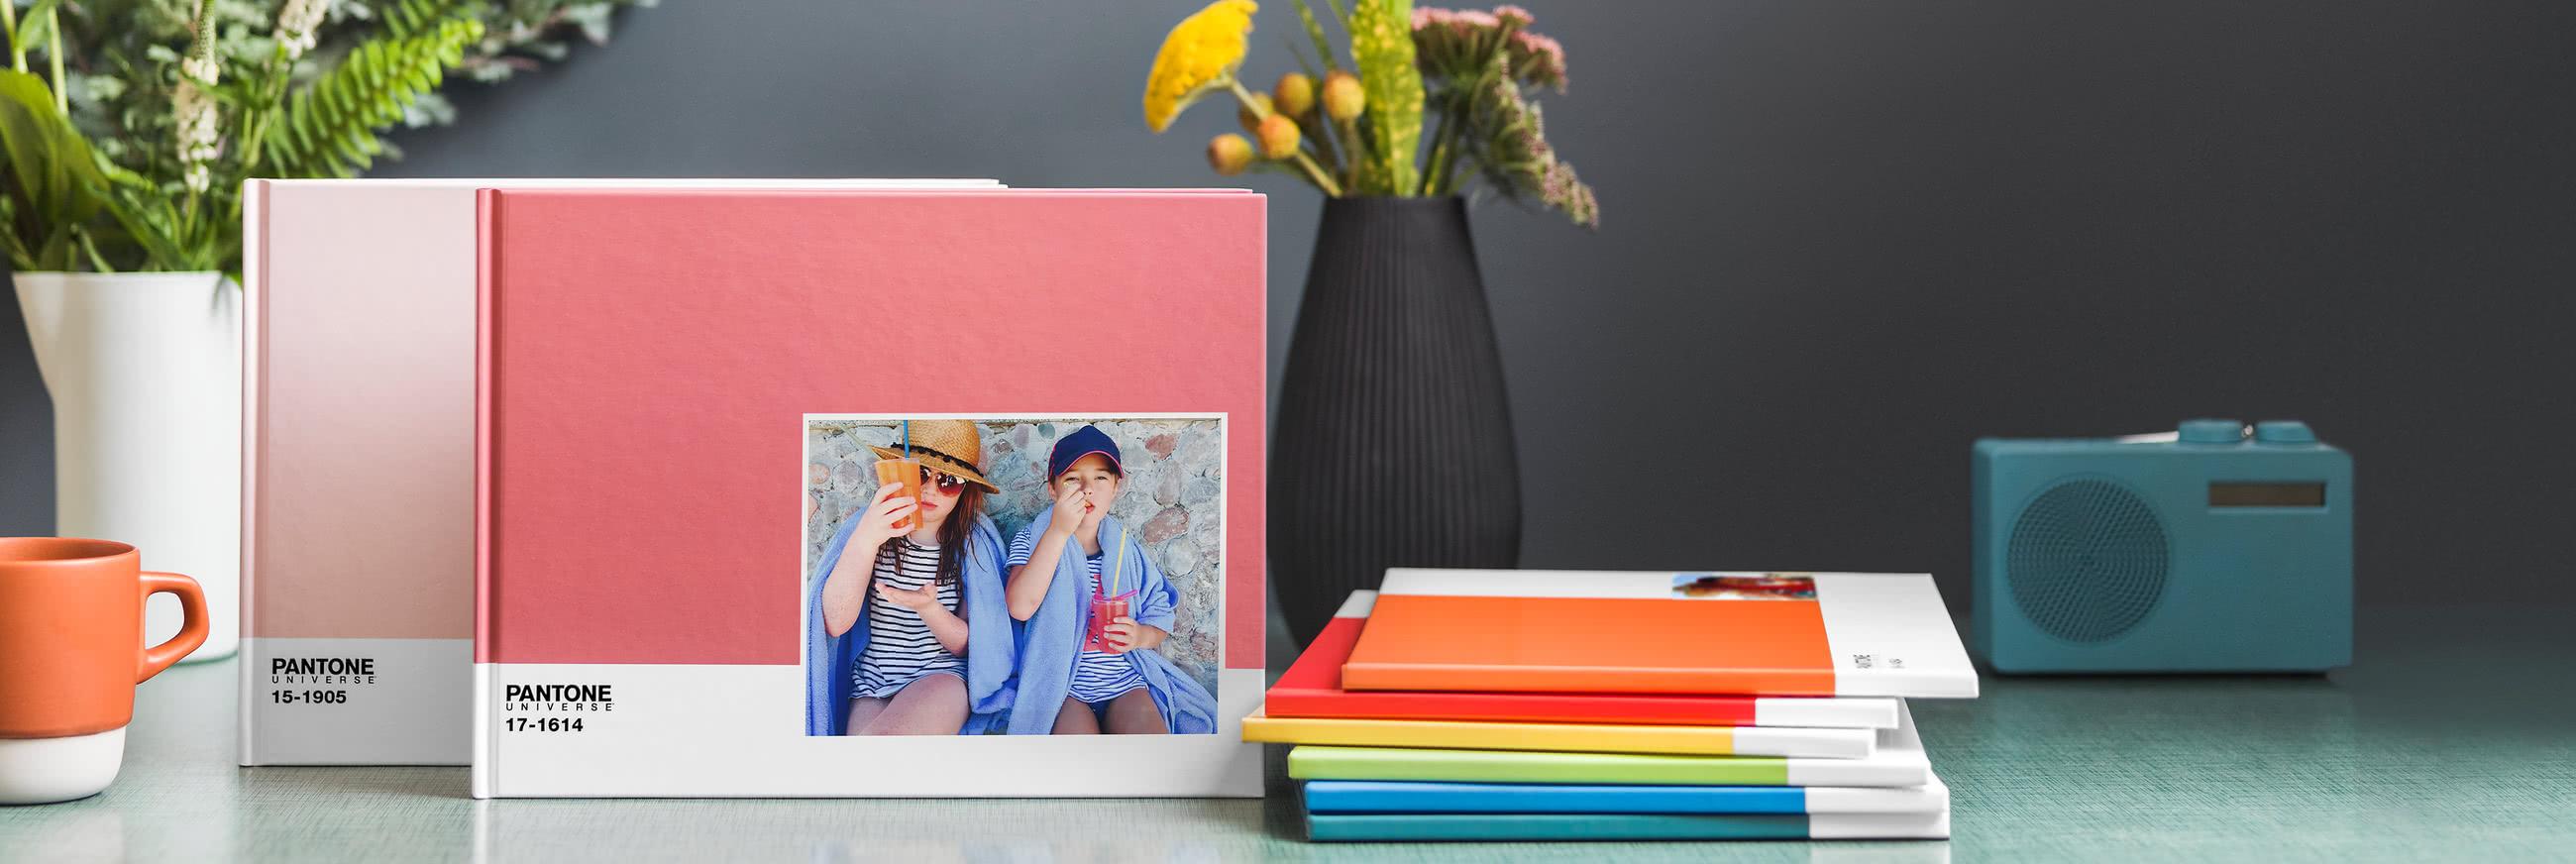 Special Edition Pantone Photo Books